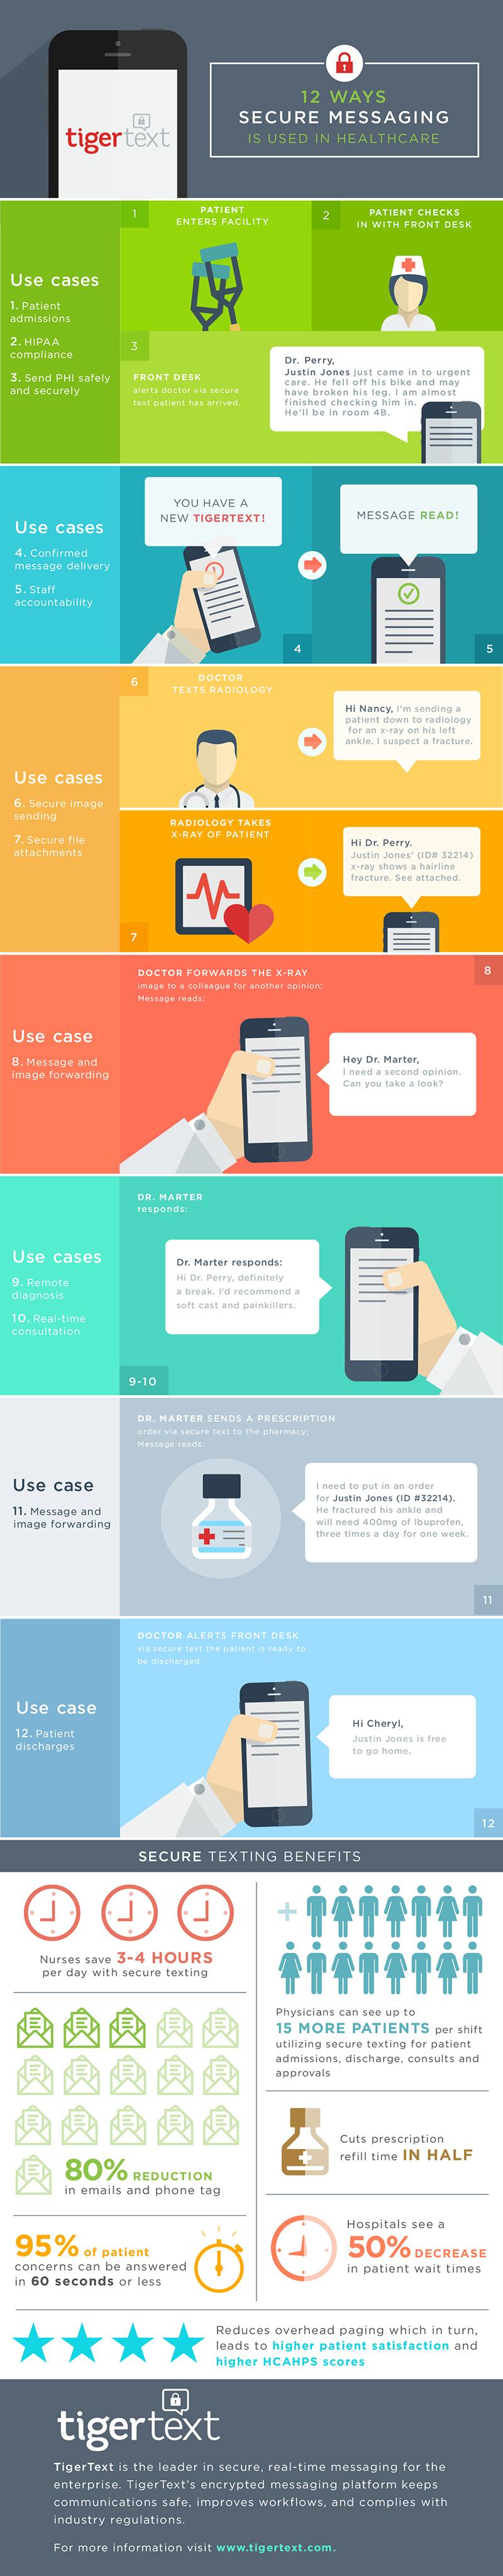 JPG - 12 Ways Secure Texting is Used in Healthcare